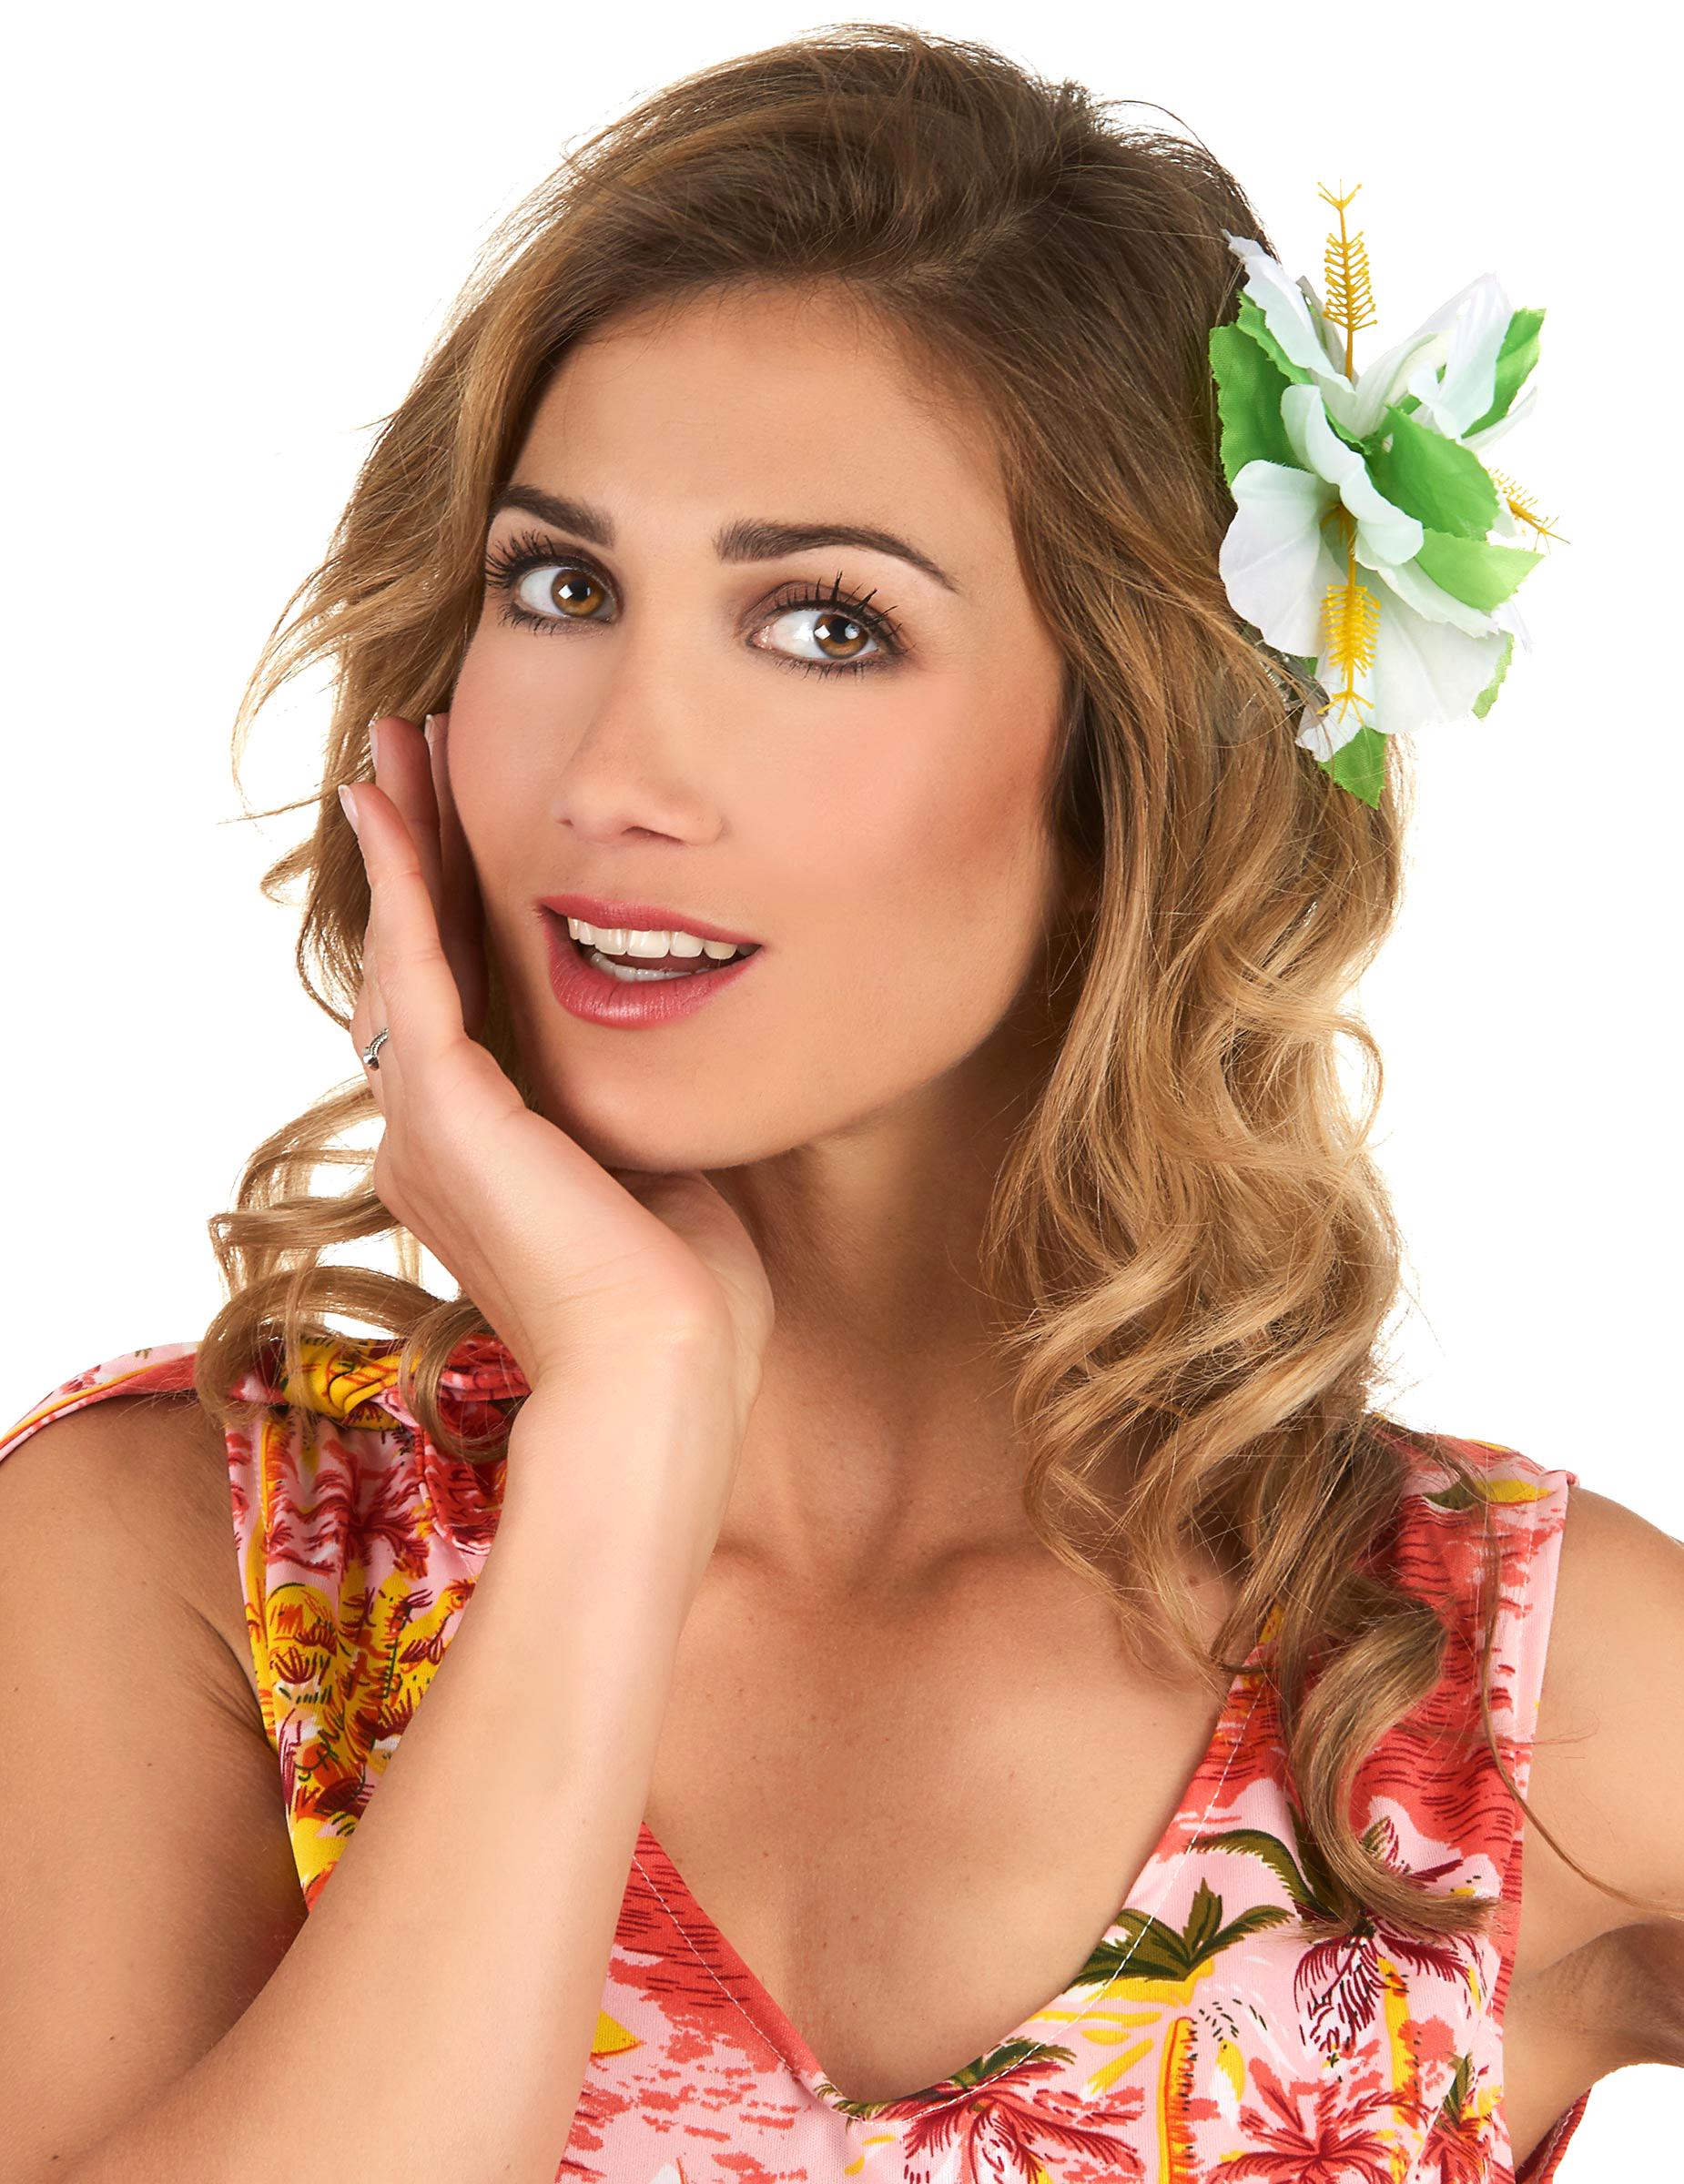 dk Hawaii Vegaoo Køb Blomst Tilbehør På Hårclips T1wYqdY